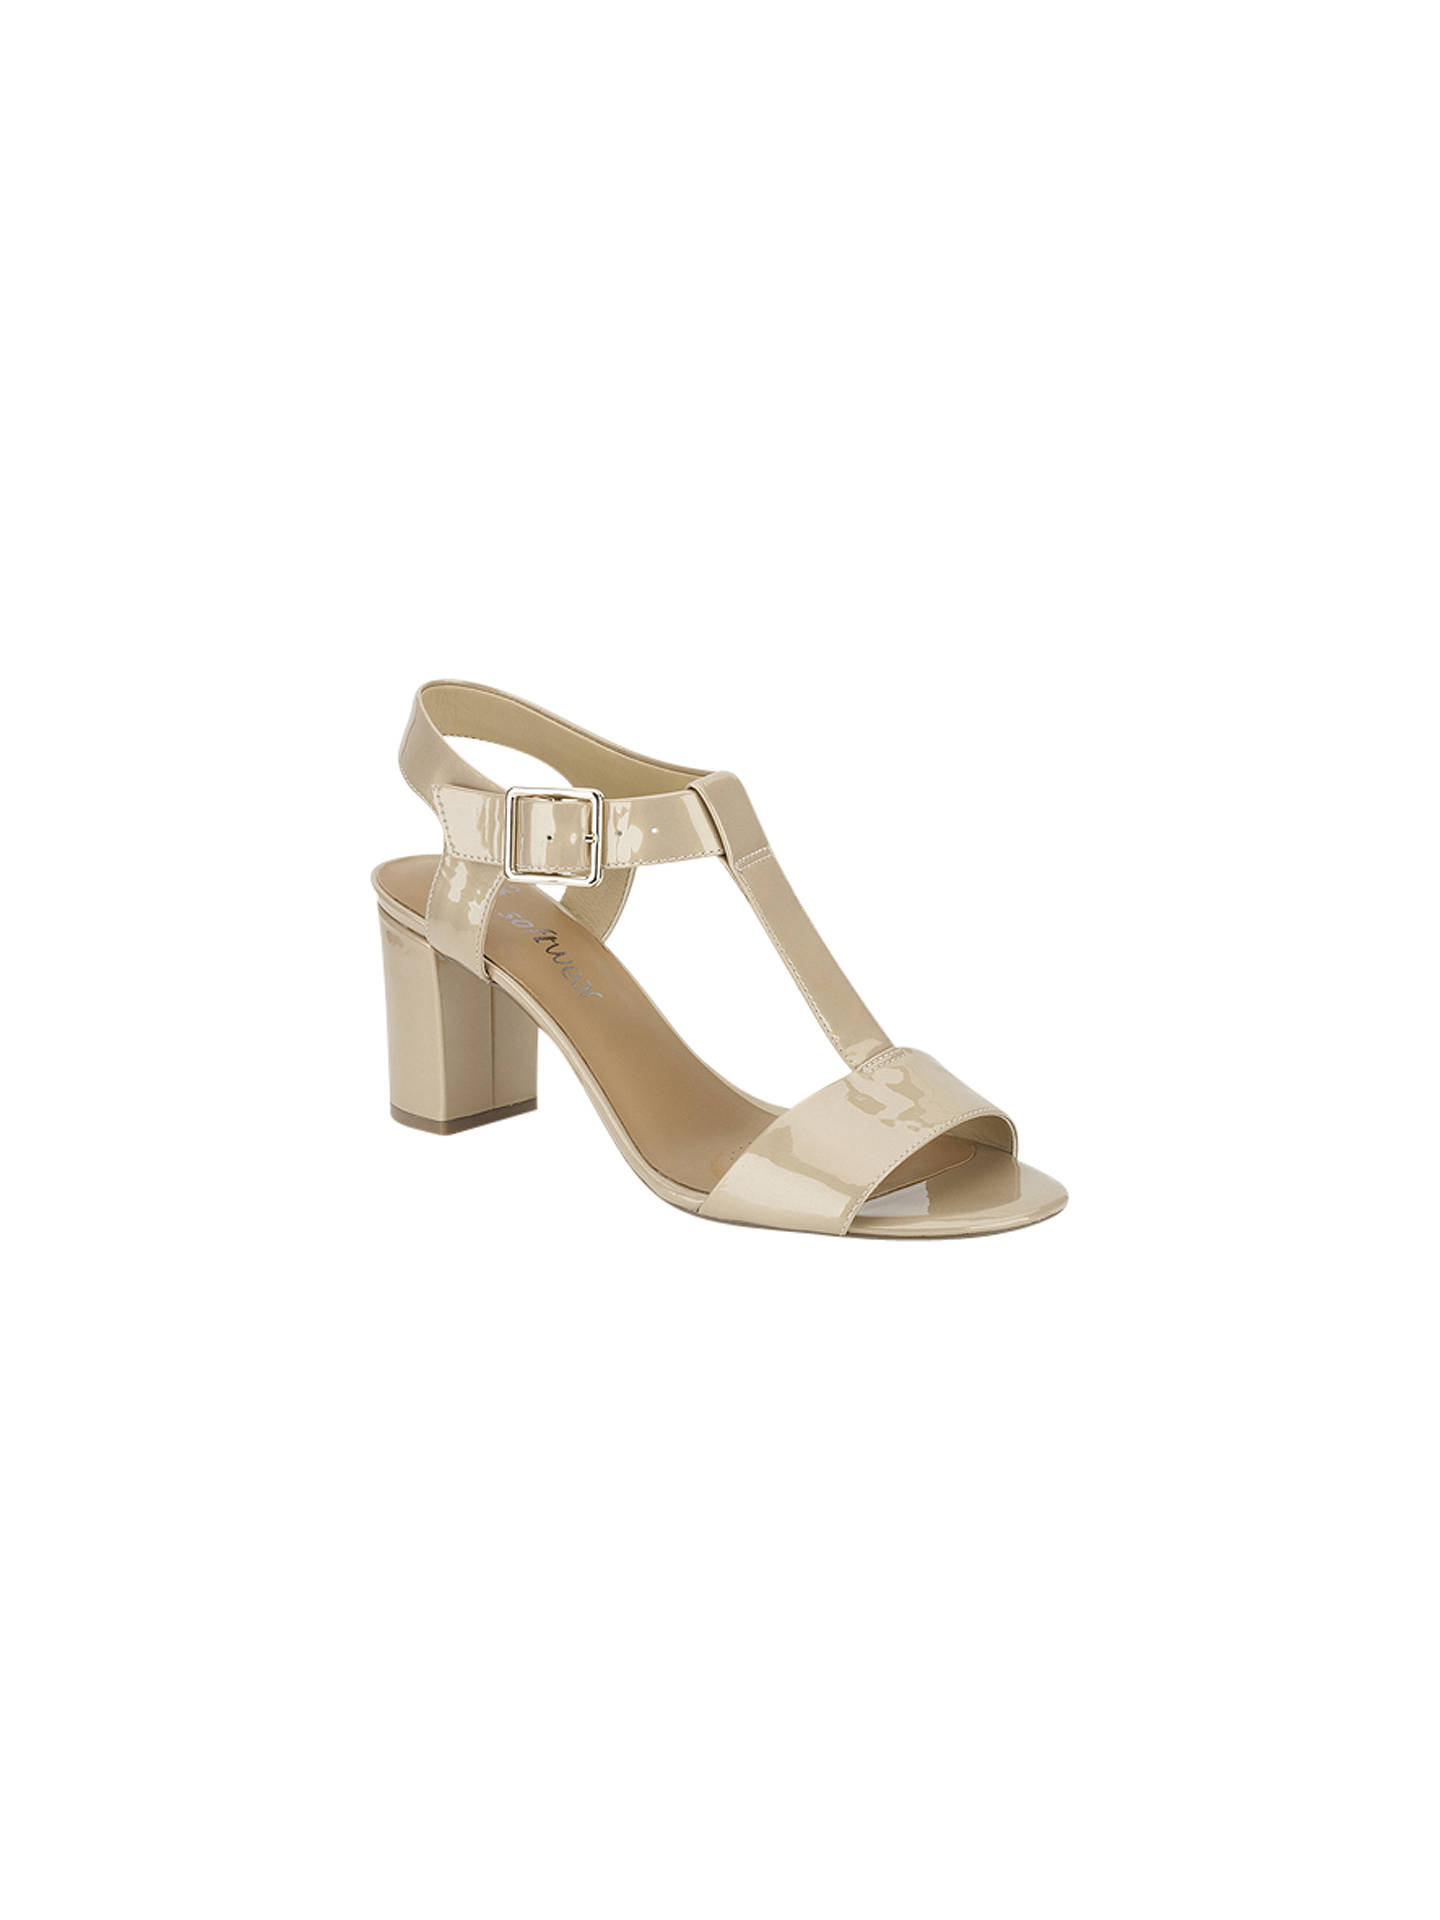 83d78e942c7c Buy Clarks Smart Deva Sandals